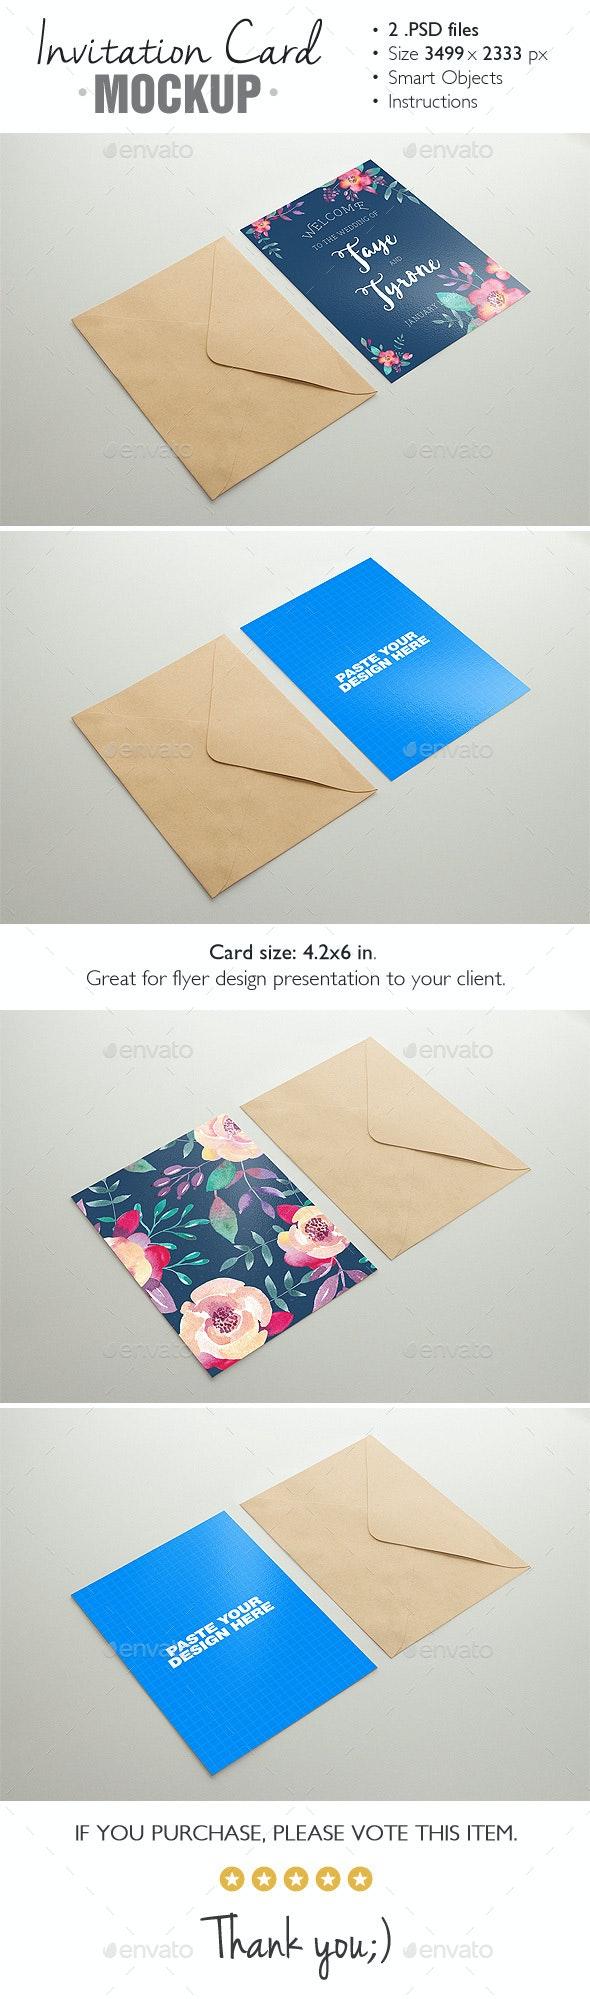 Invitation Card Mockup v.3 - Product Mock-Ups Graphics